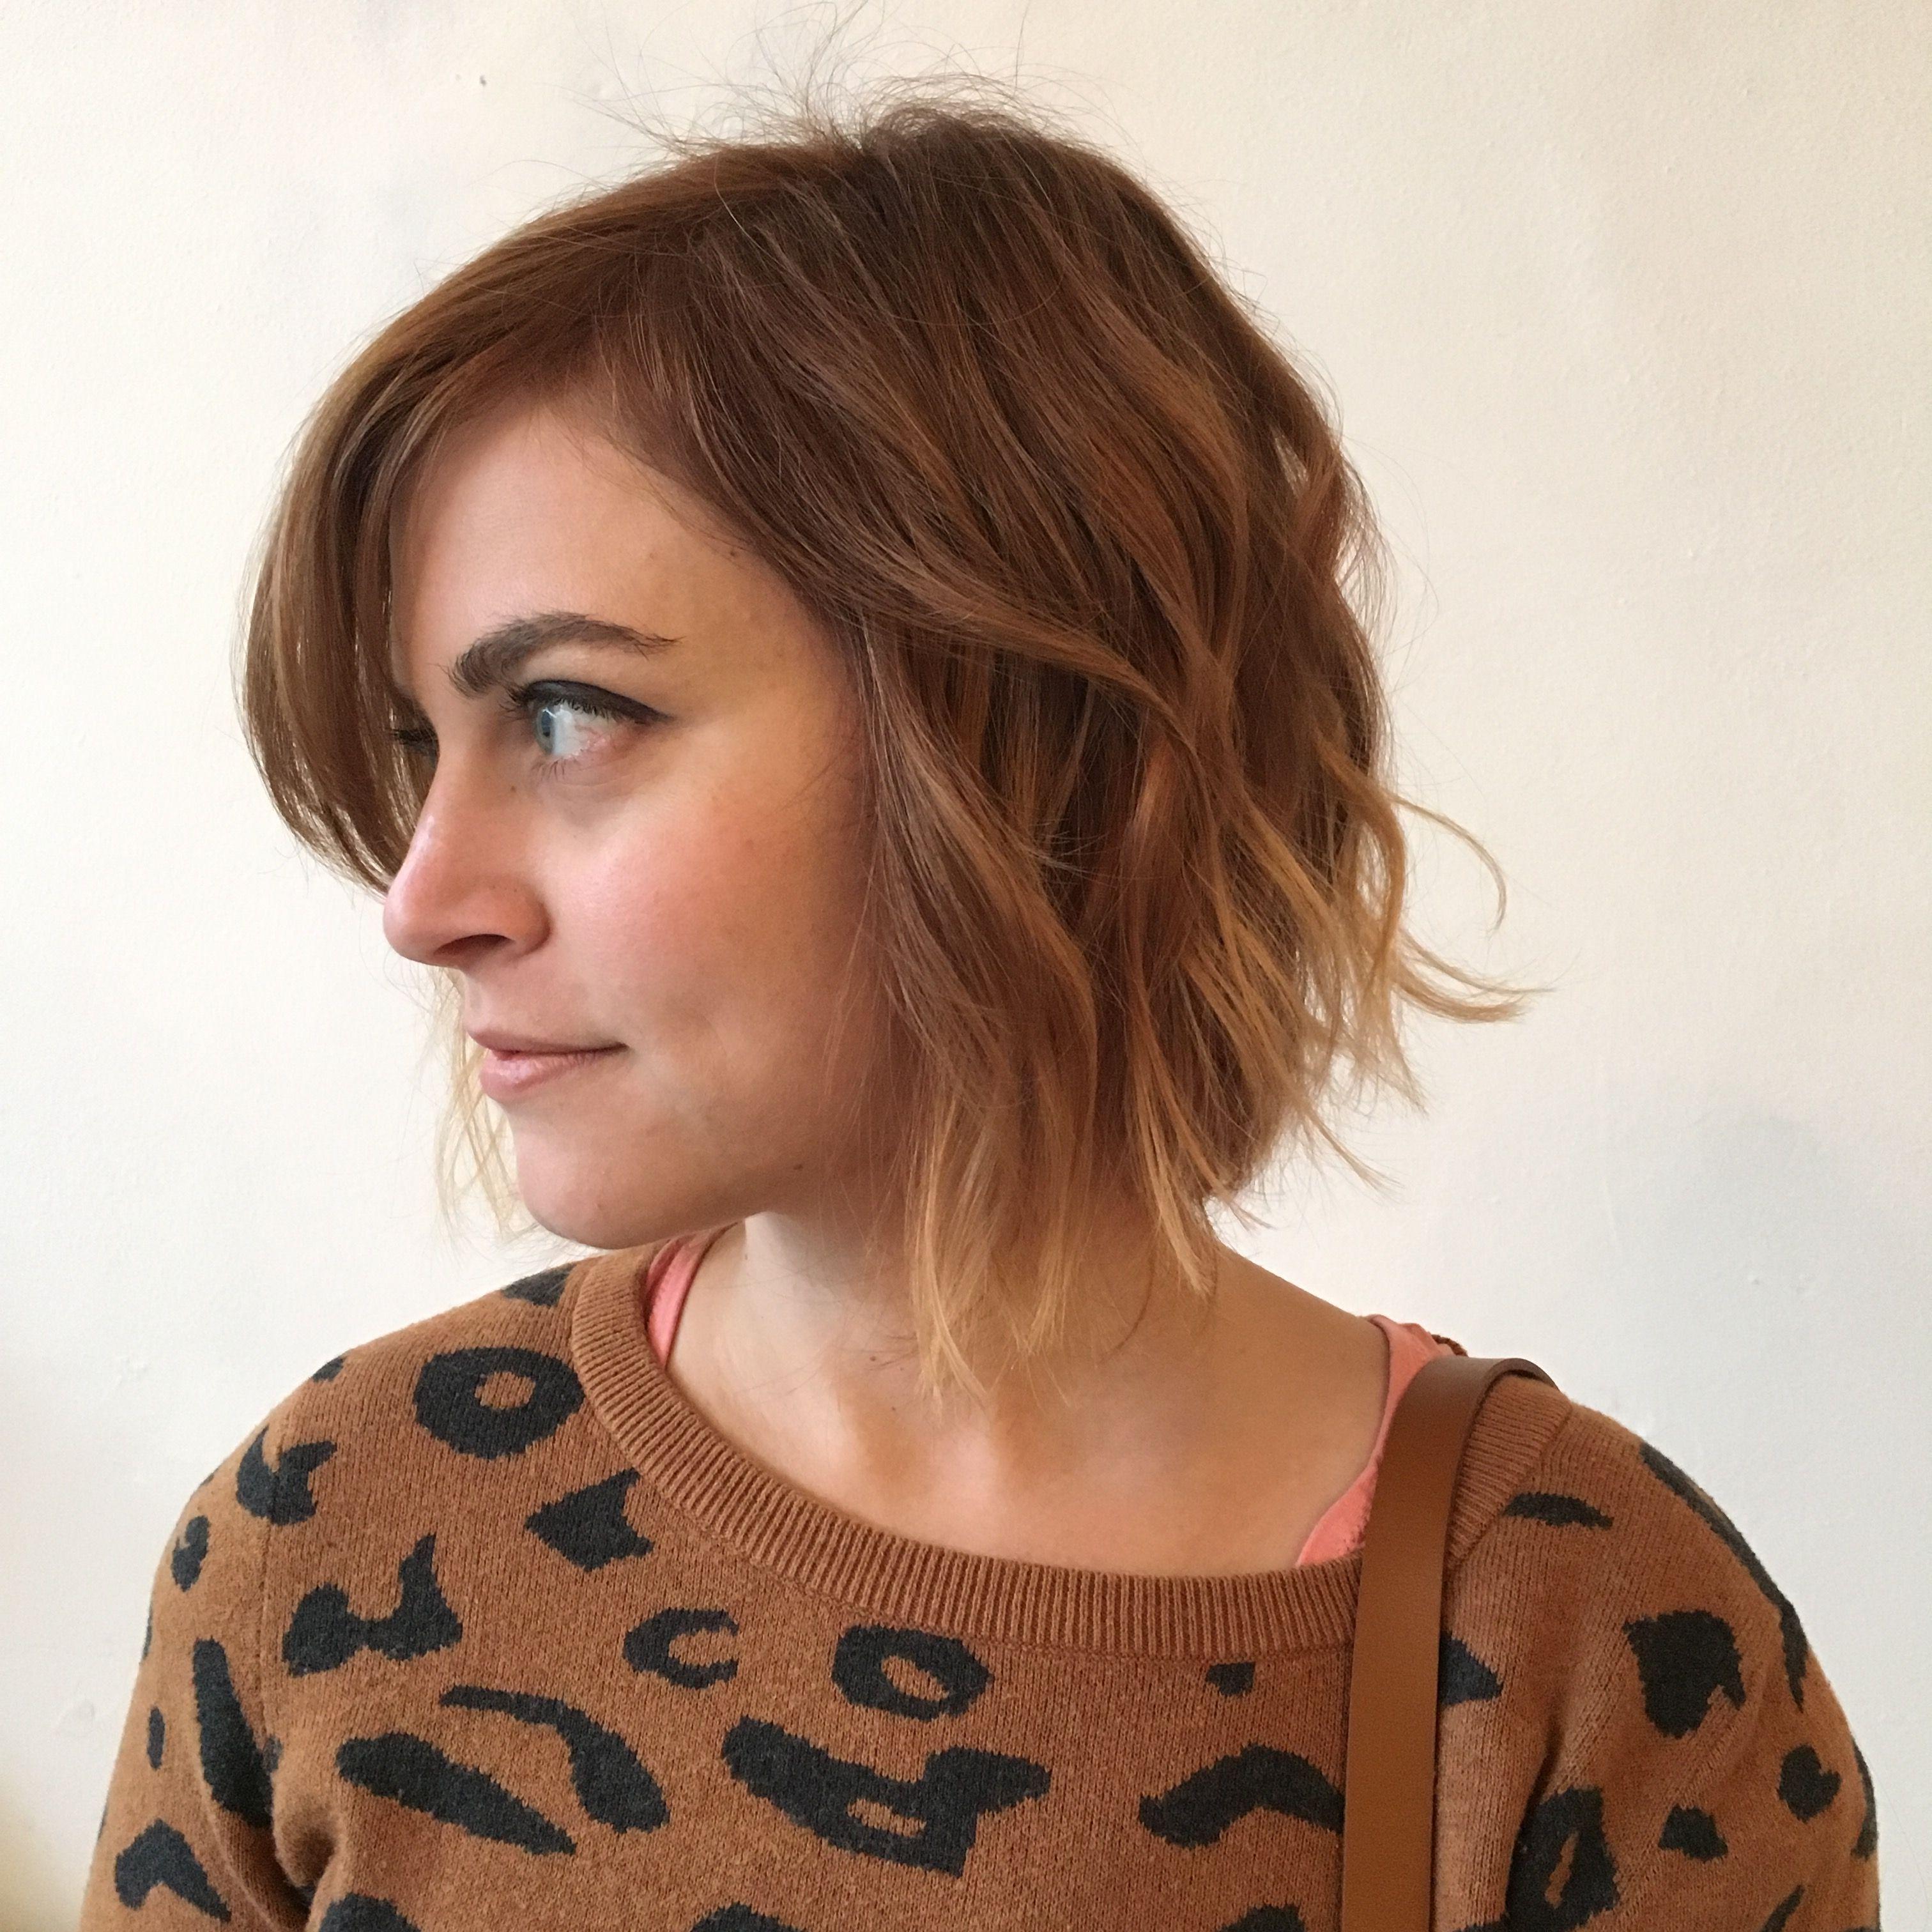 Hair by Shannon at Dandelion Salon in Nashville TN Model Devon